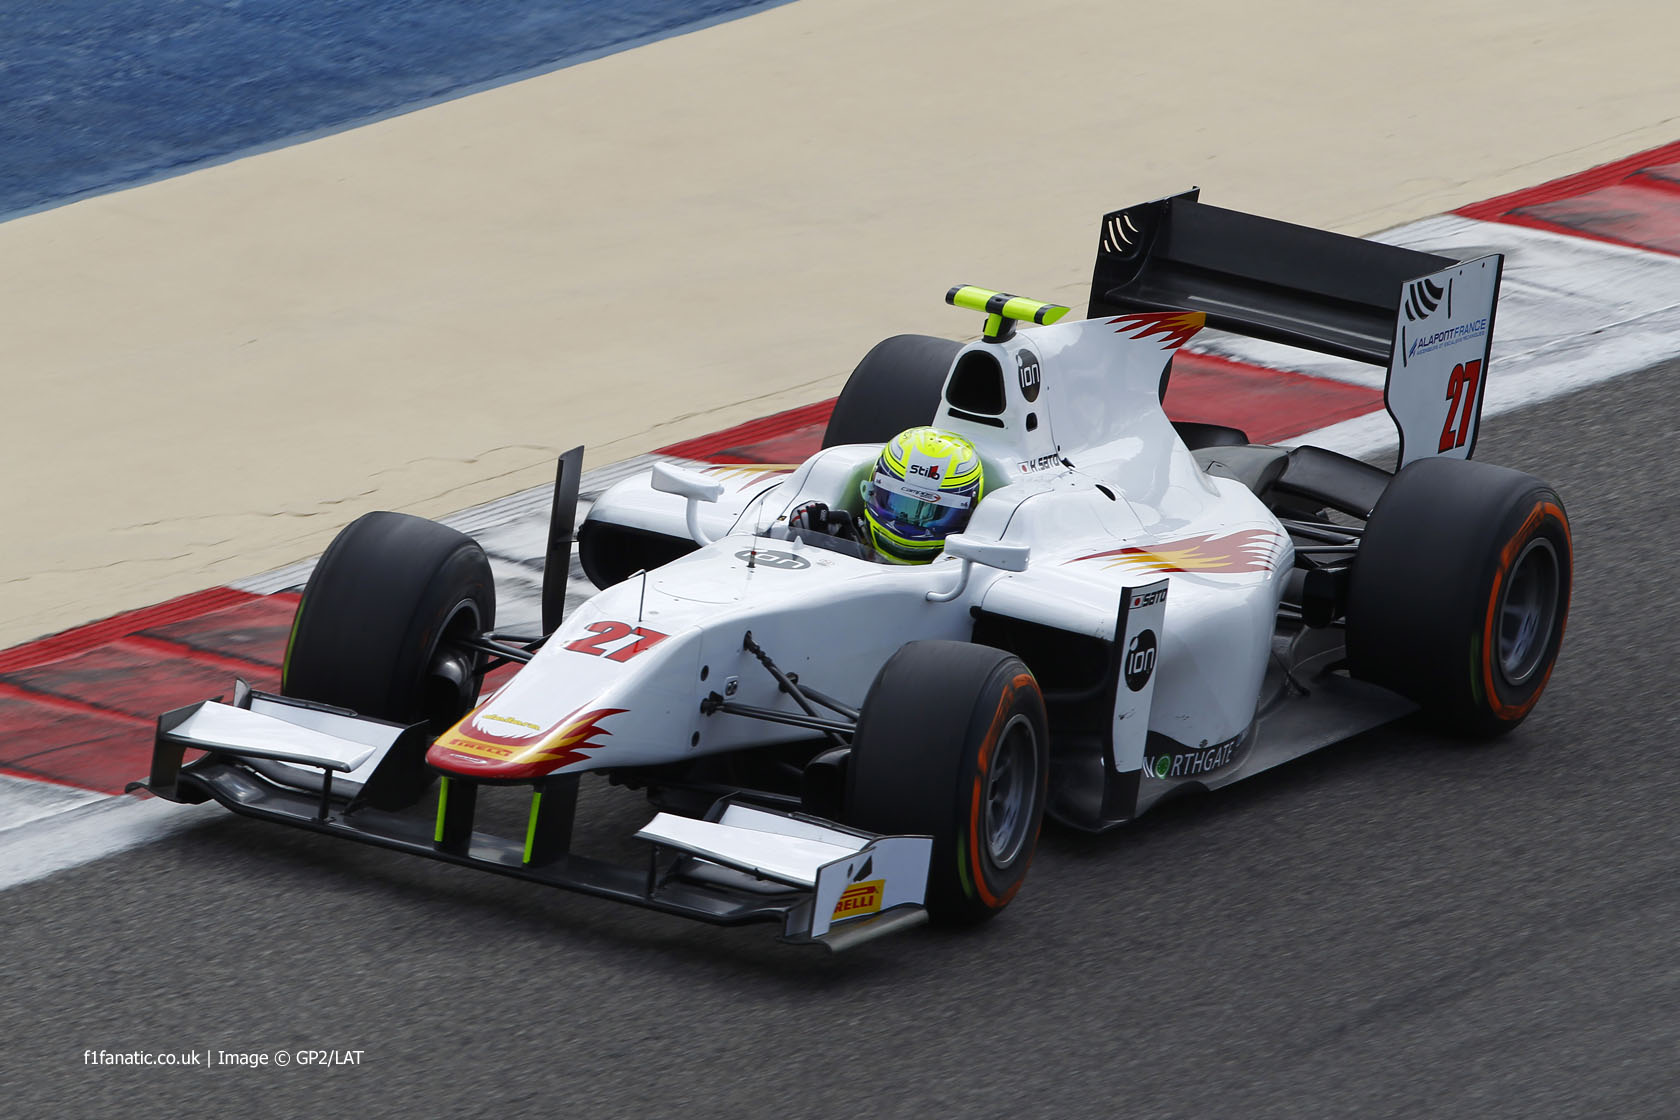 Kimiya Sato, Campos, GP2, Bahrain, 2014